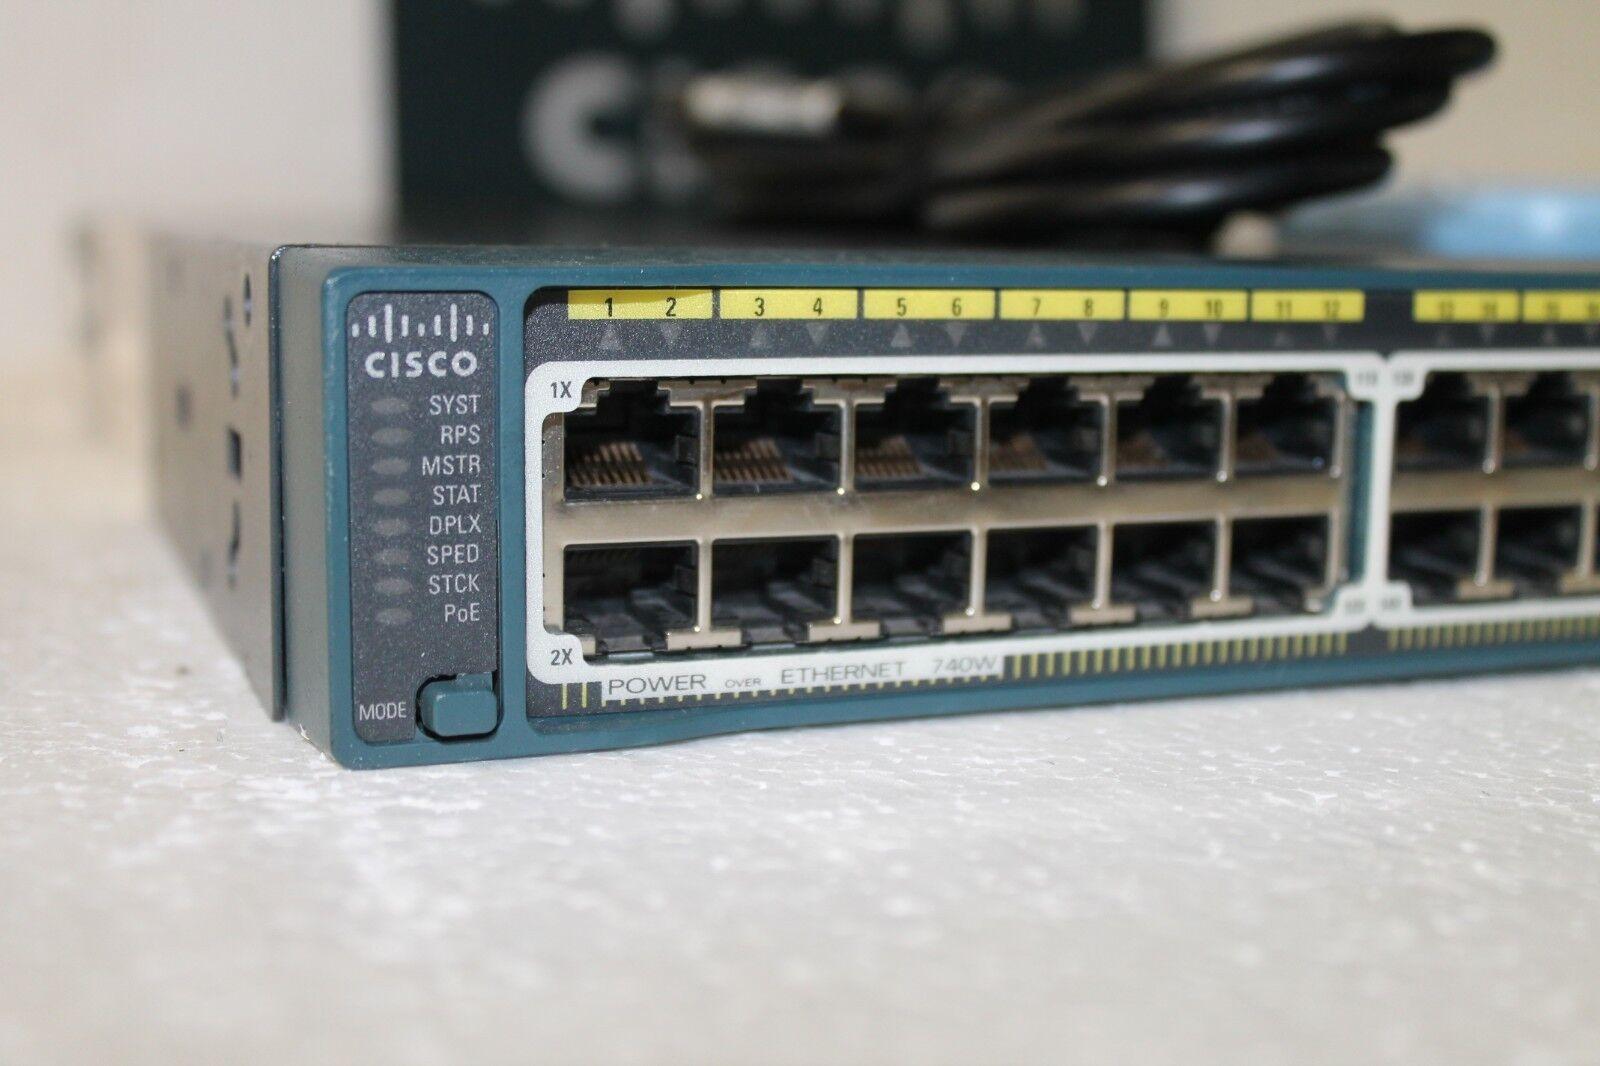 Cisco WS-C2960S-48FPS-L Catalyst 2960-S 48-Port PoE+ Network Switch